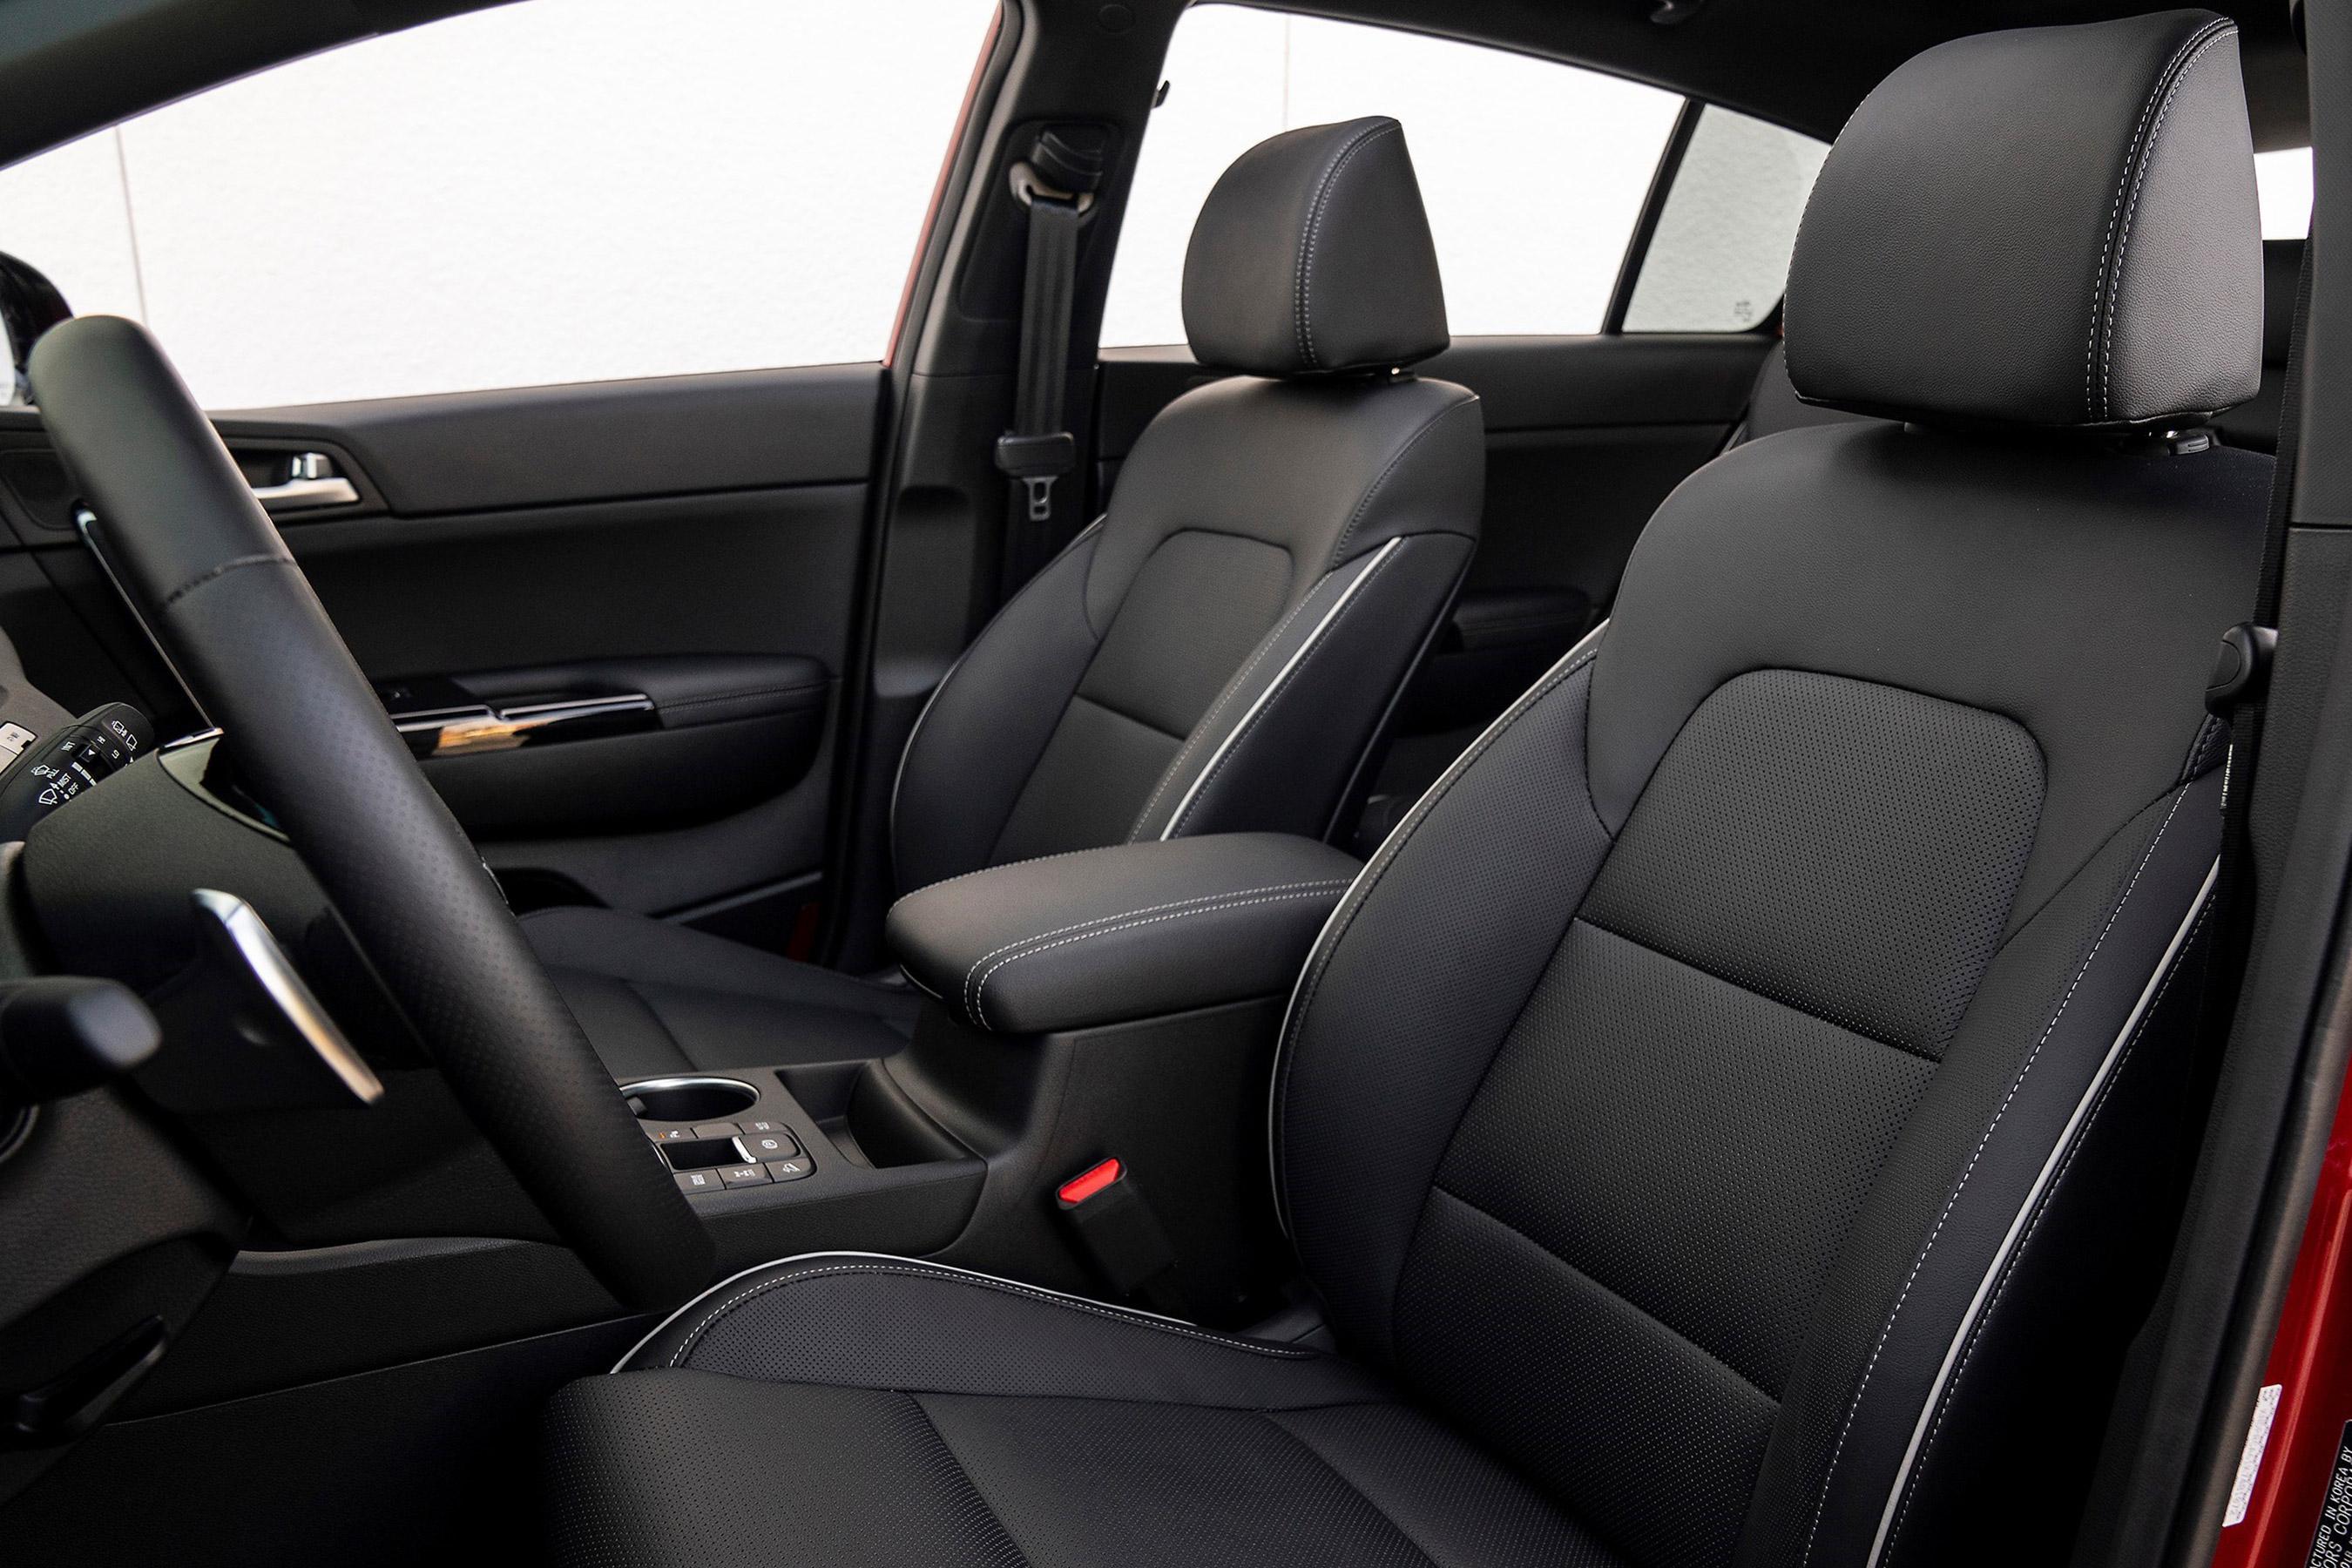 Interior of the 2020 Kia Sportage